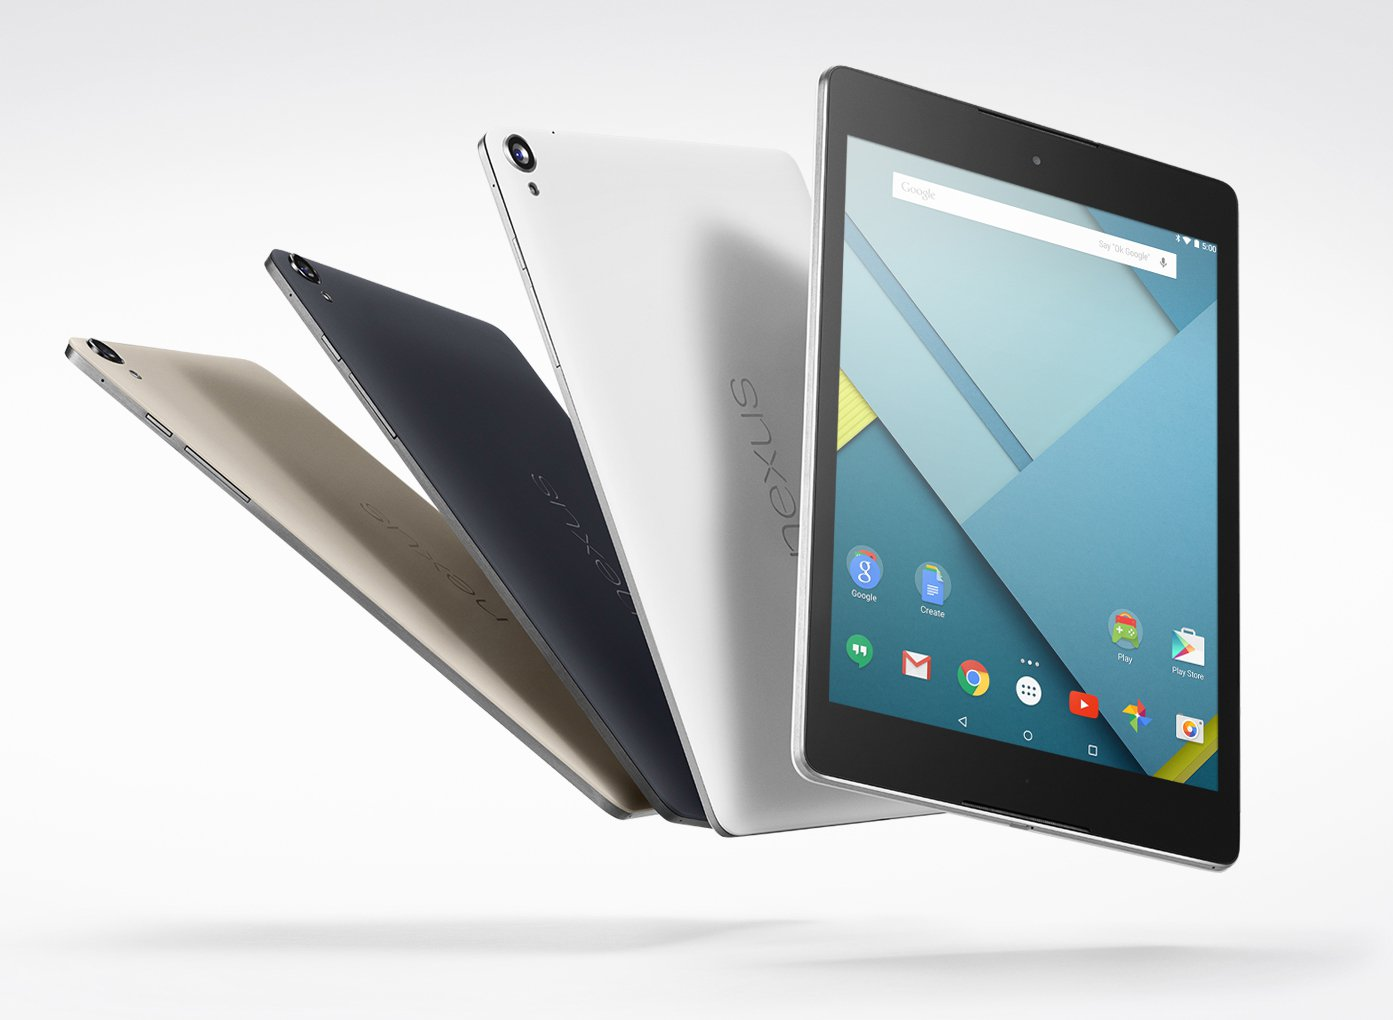 Cyber Monday Deals on Google Nexus Tablets